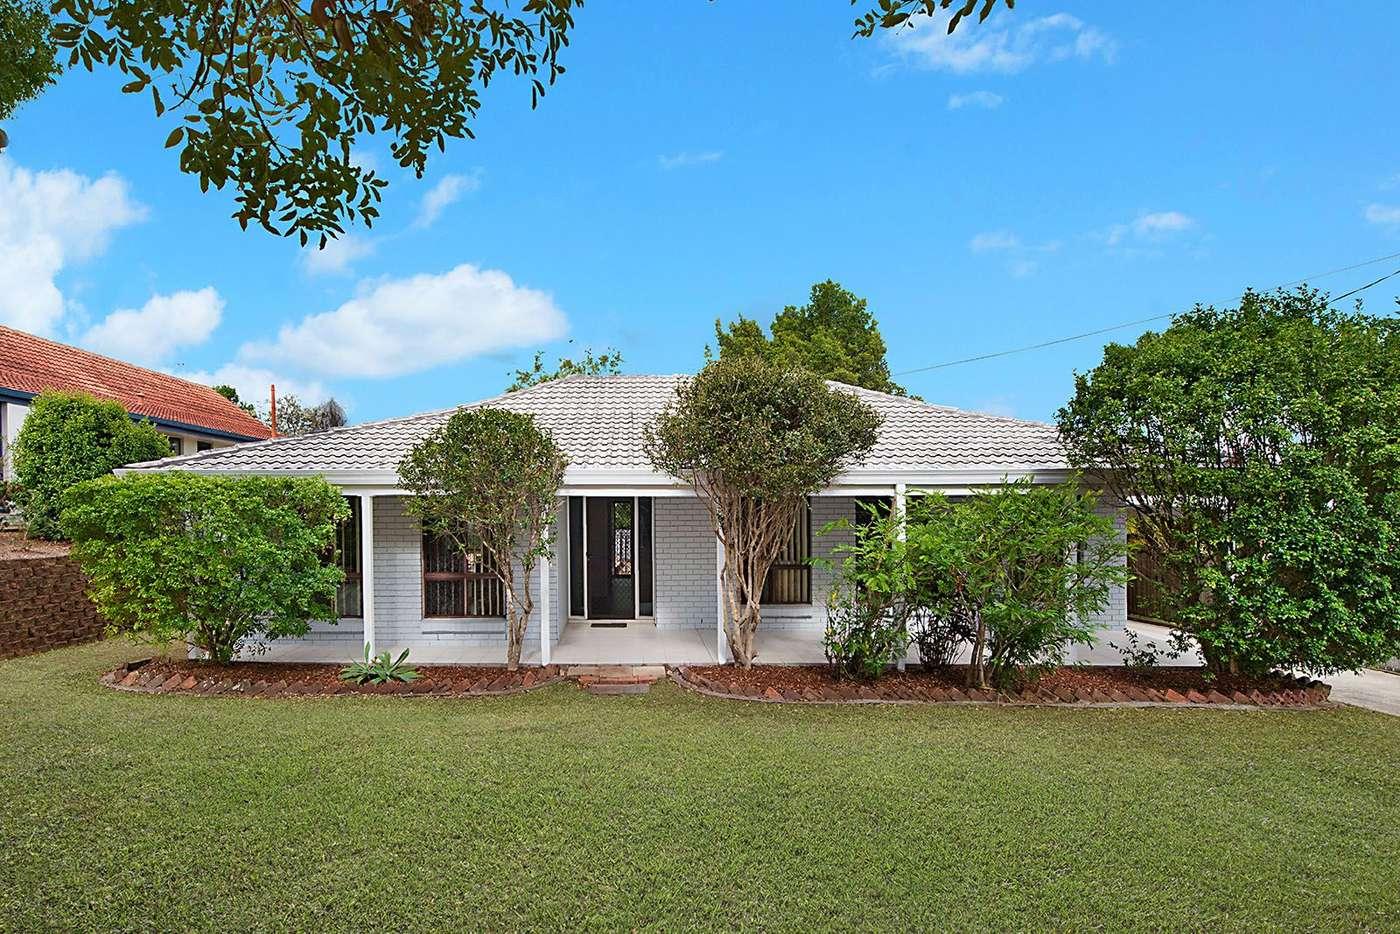 Main view of Homely house listing, 24 Samarai Street, Moggill QLD 4070